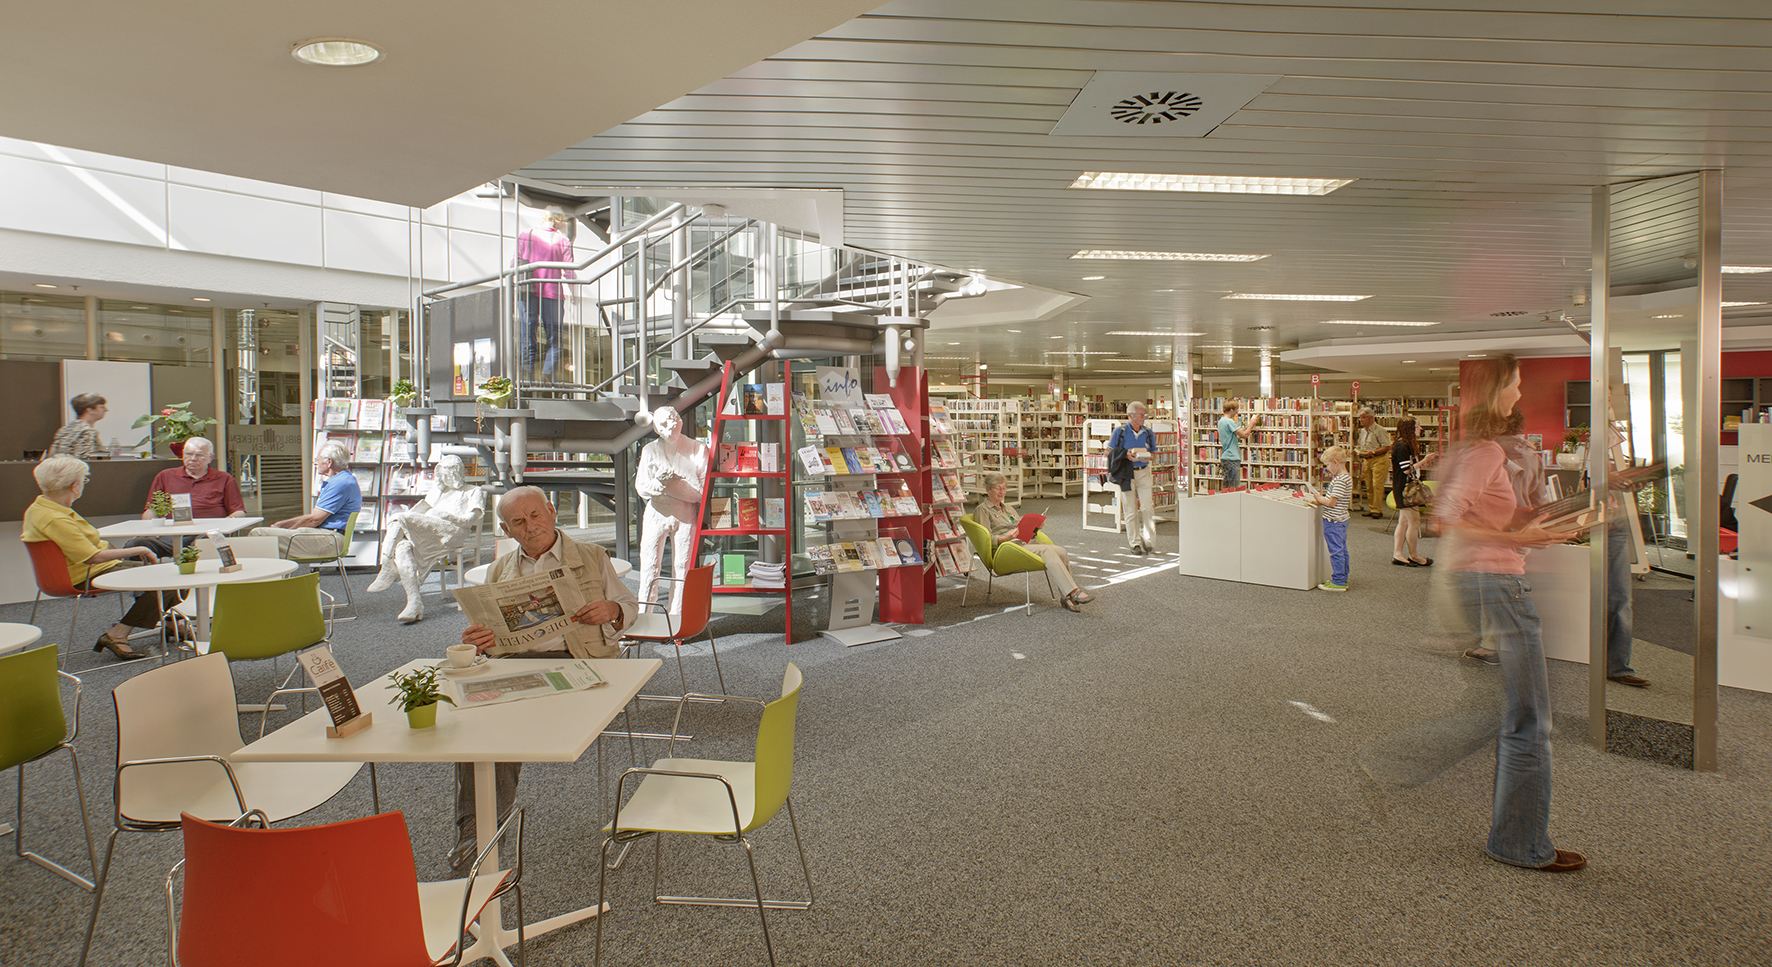 Bibliothek_COW5729